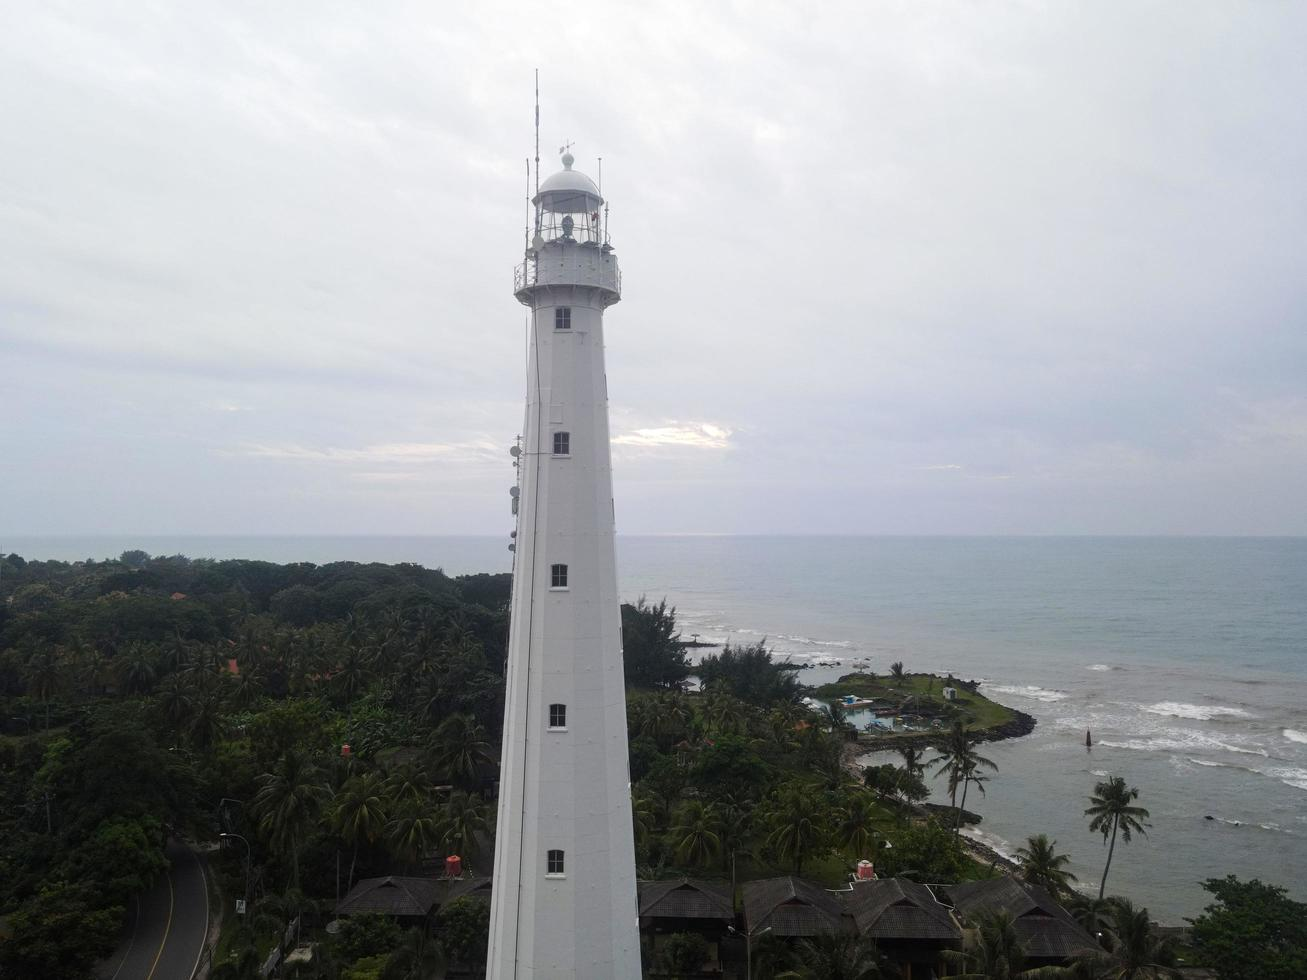 Banten, Indonesien 2021 - Luftaufnahme der Sonnenuntergangslandschaft des Leuchtturm-Seefels foto